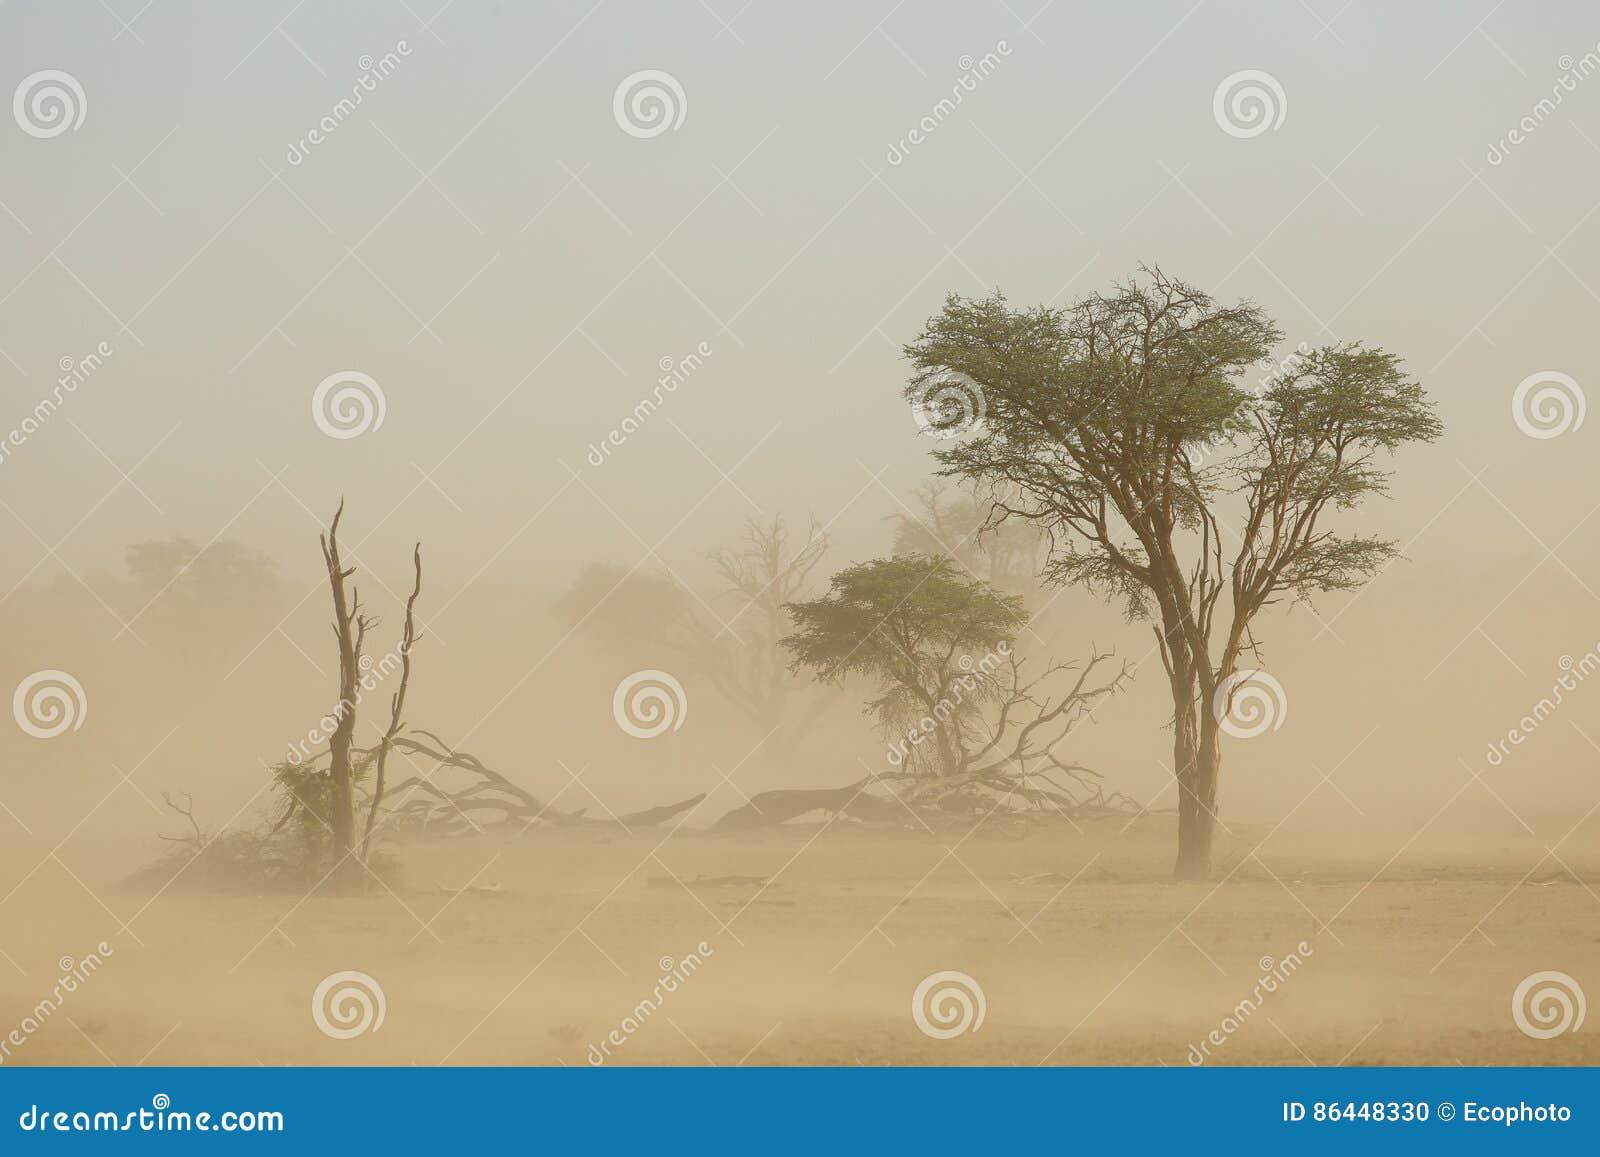 Sand storm - Kalahari desert